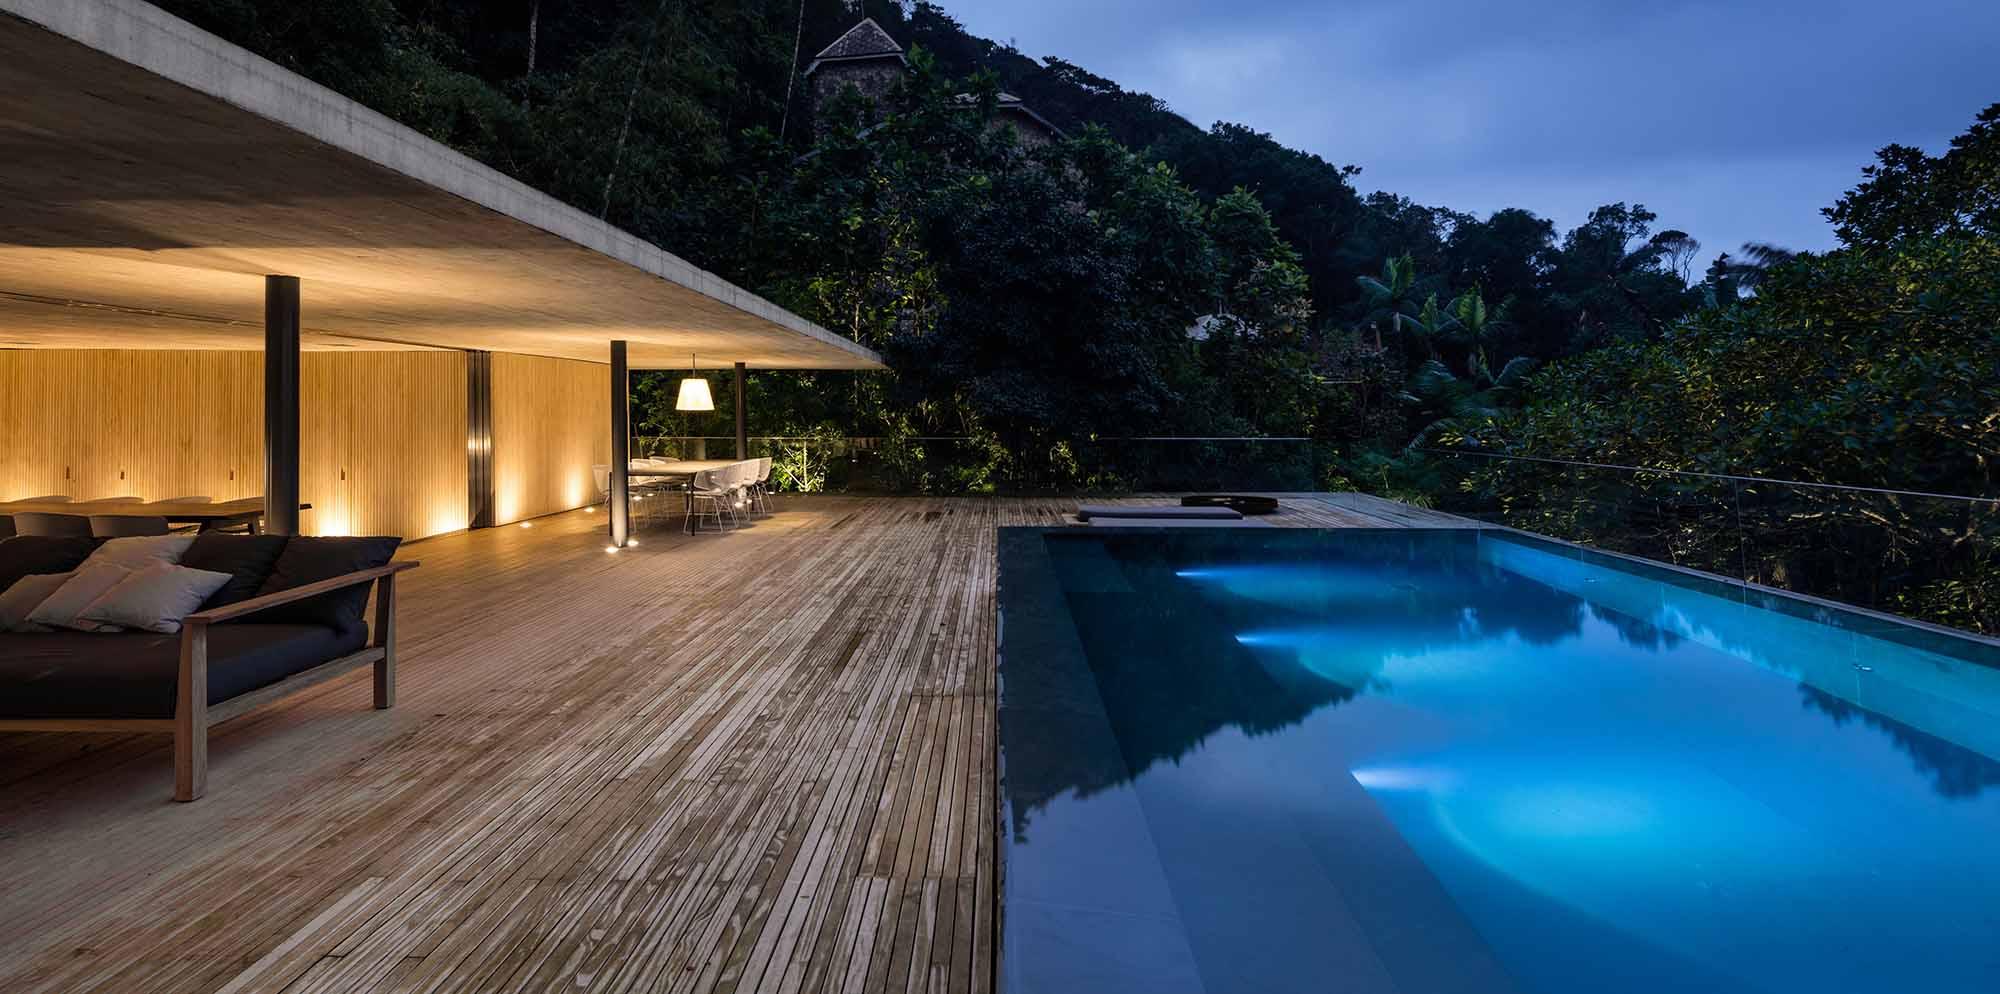 H-House-Life-Jungle-House-Casa-Da-Mata-studio-mk27-mk27_namata_fernandoguerra_medium(53).JPG